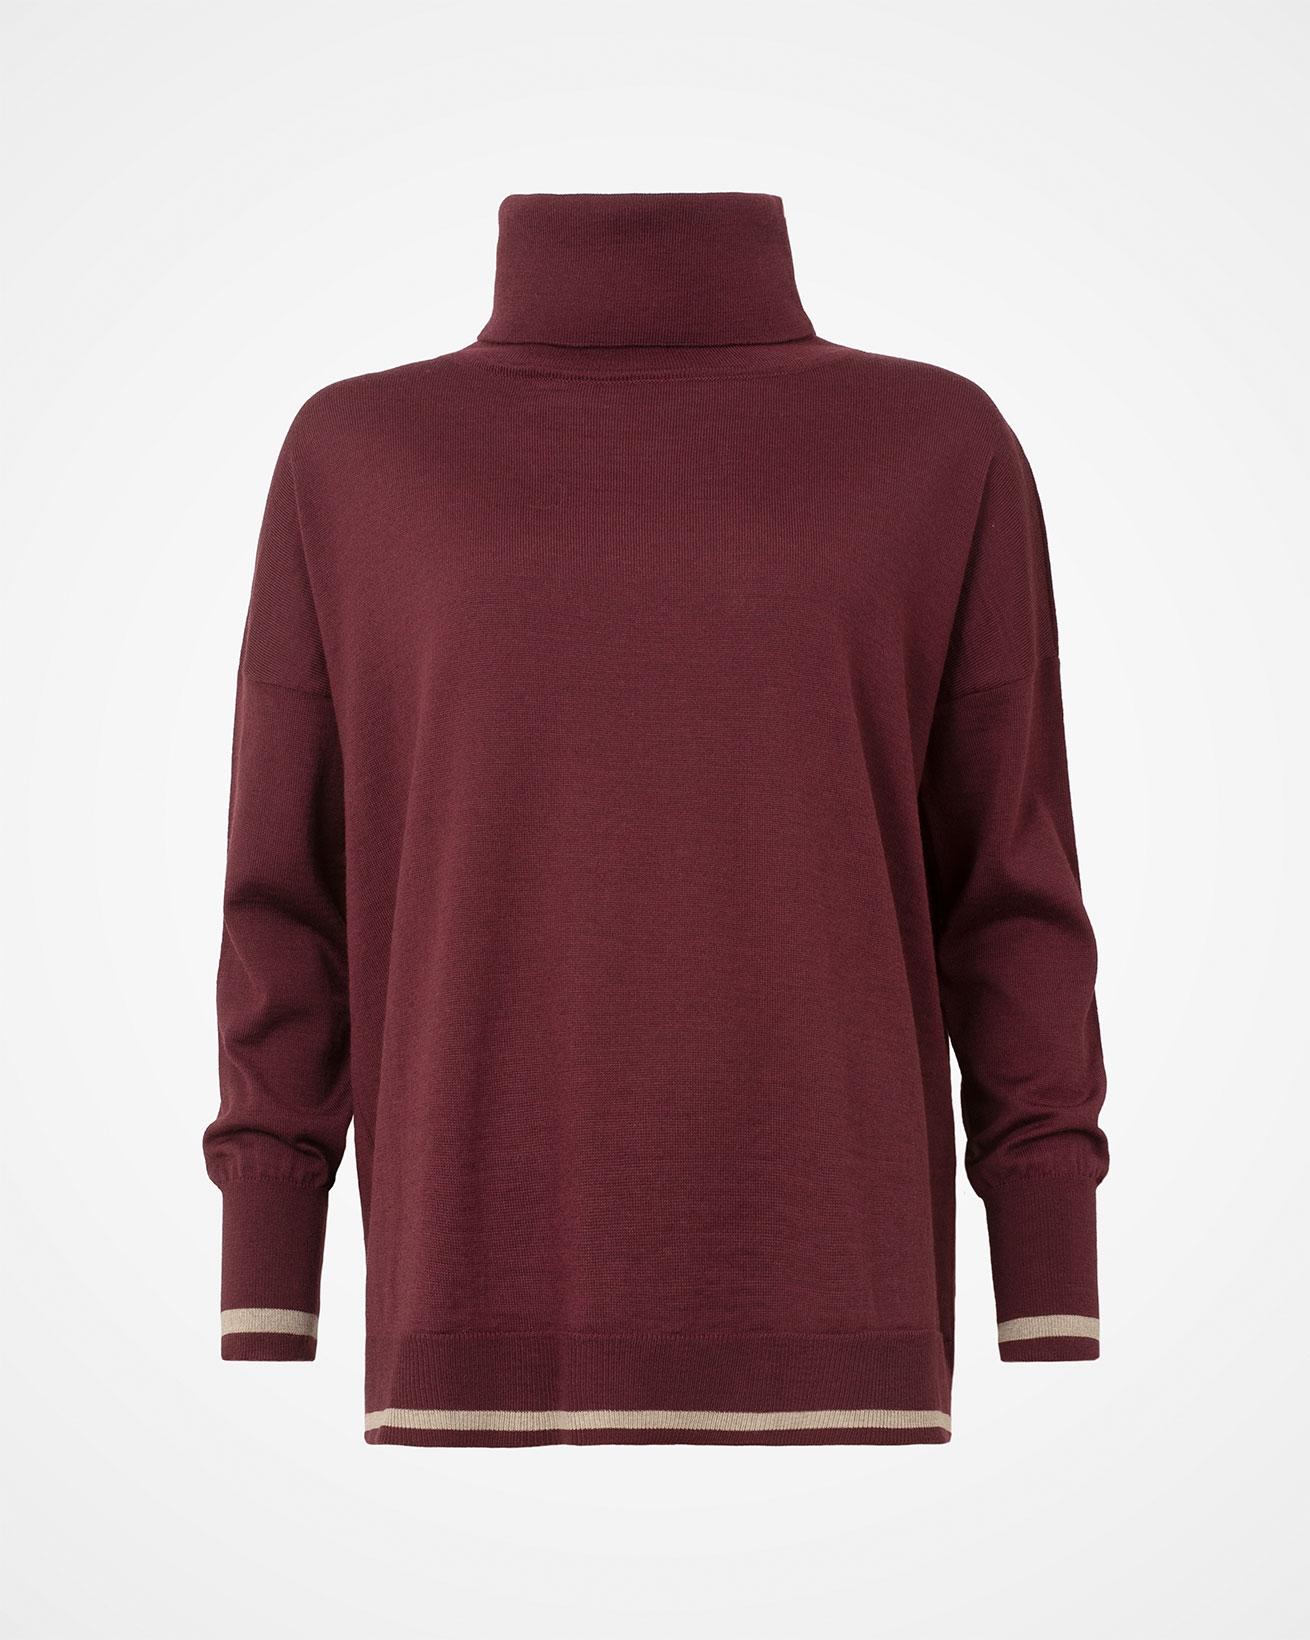 7401_slouchy-fine-knit-roll-neck-jumper_claret-oatmeal_front.jpg